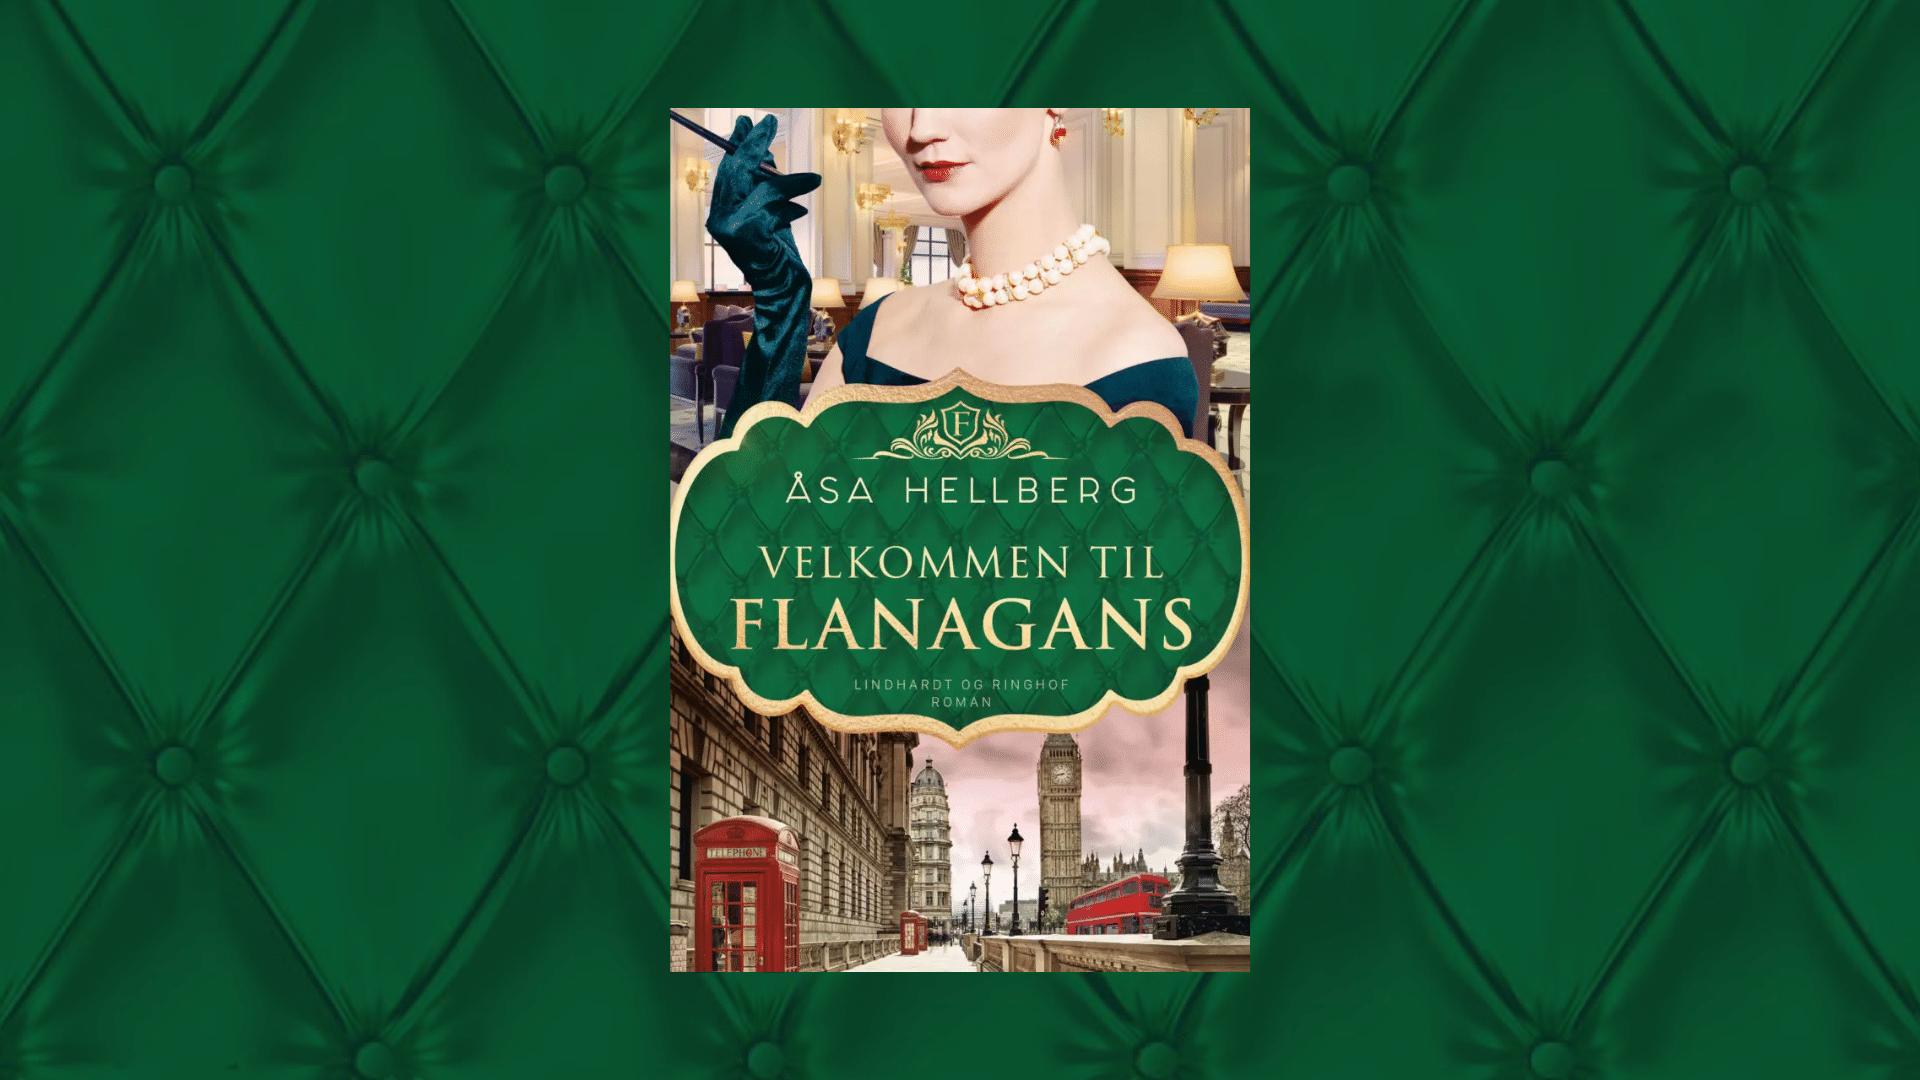 Velkommen til Flanagans